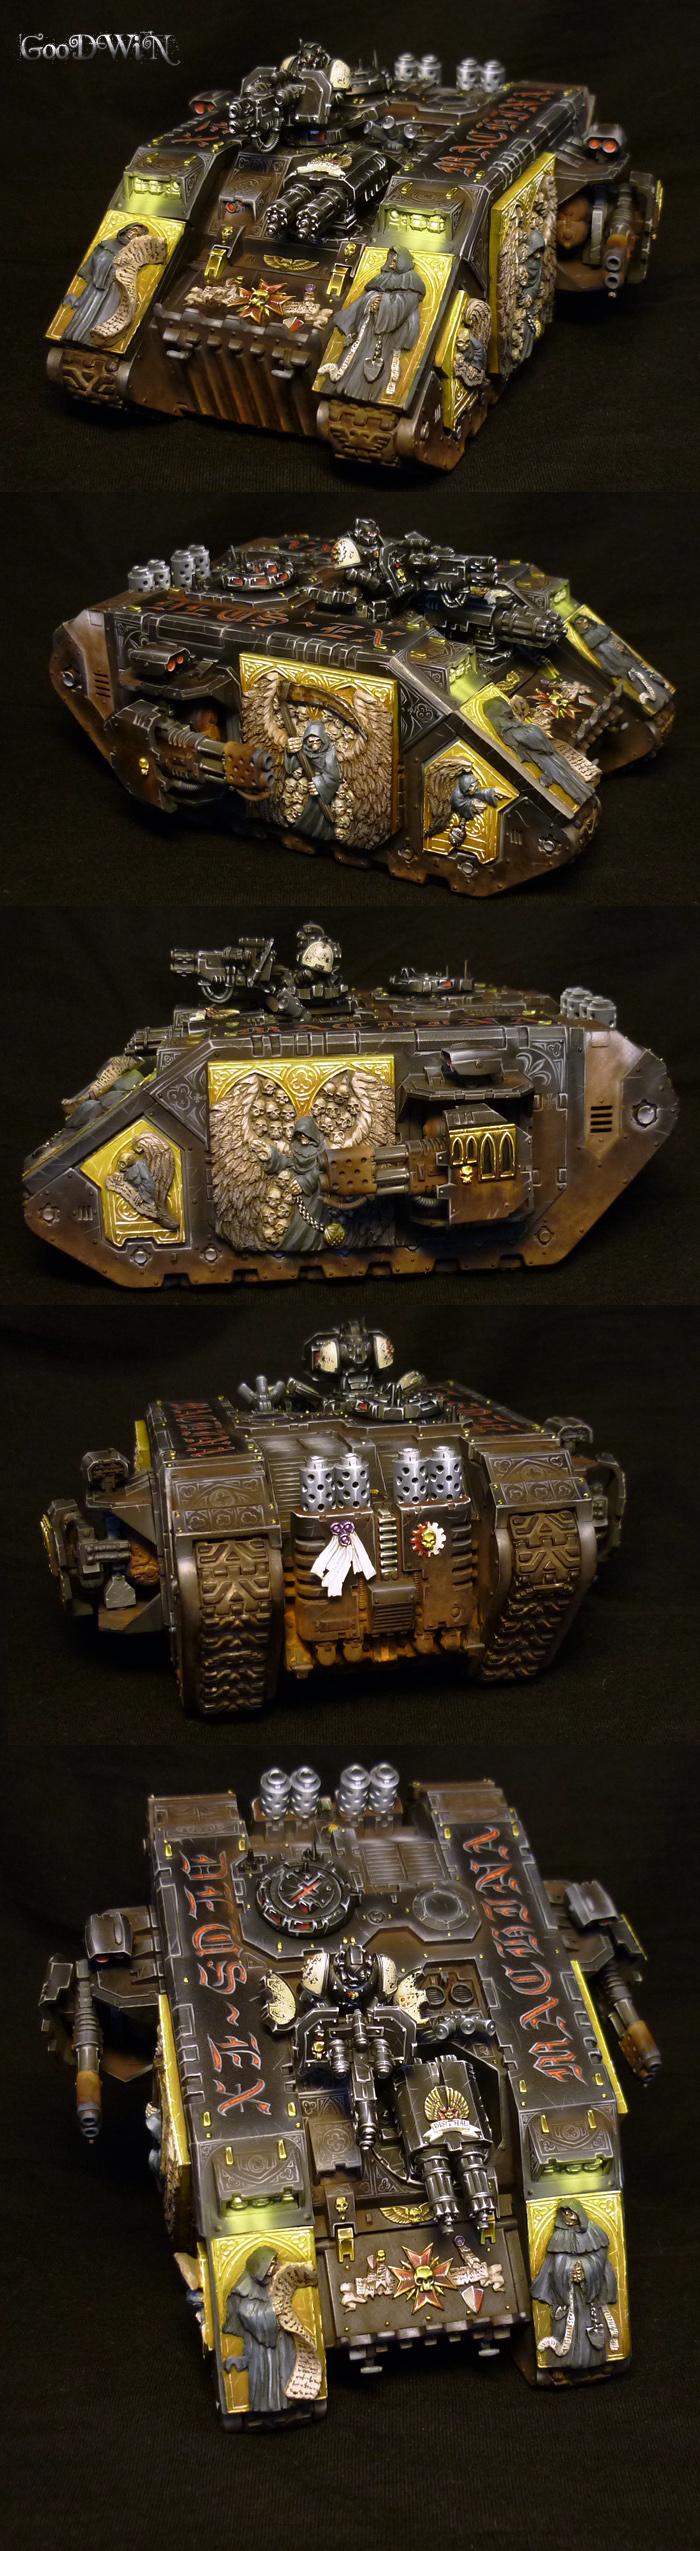 CoolMiniOrNot - Black Templars Land Raider by lordNicon